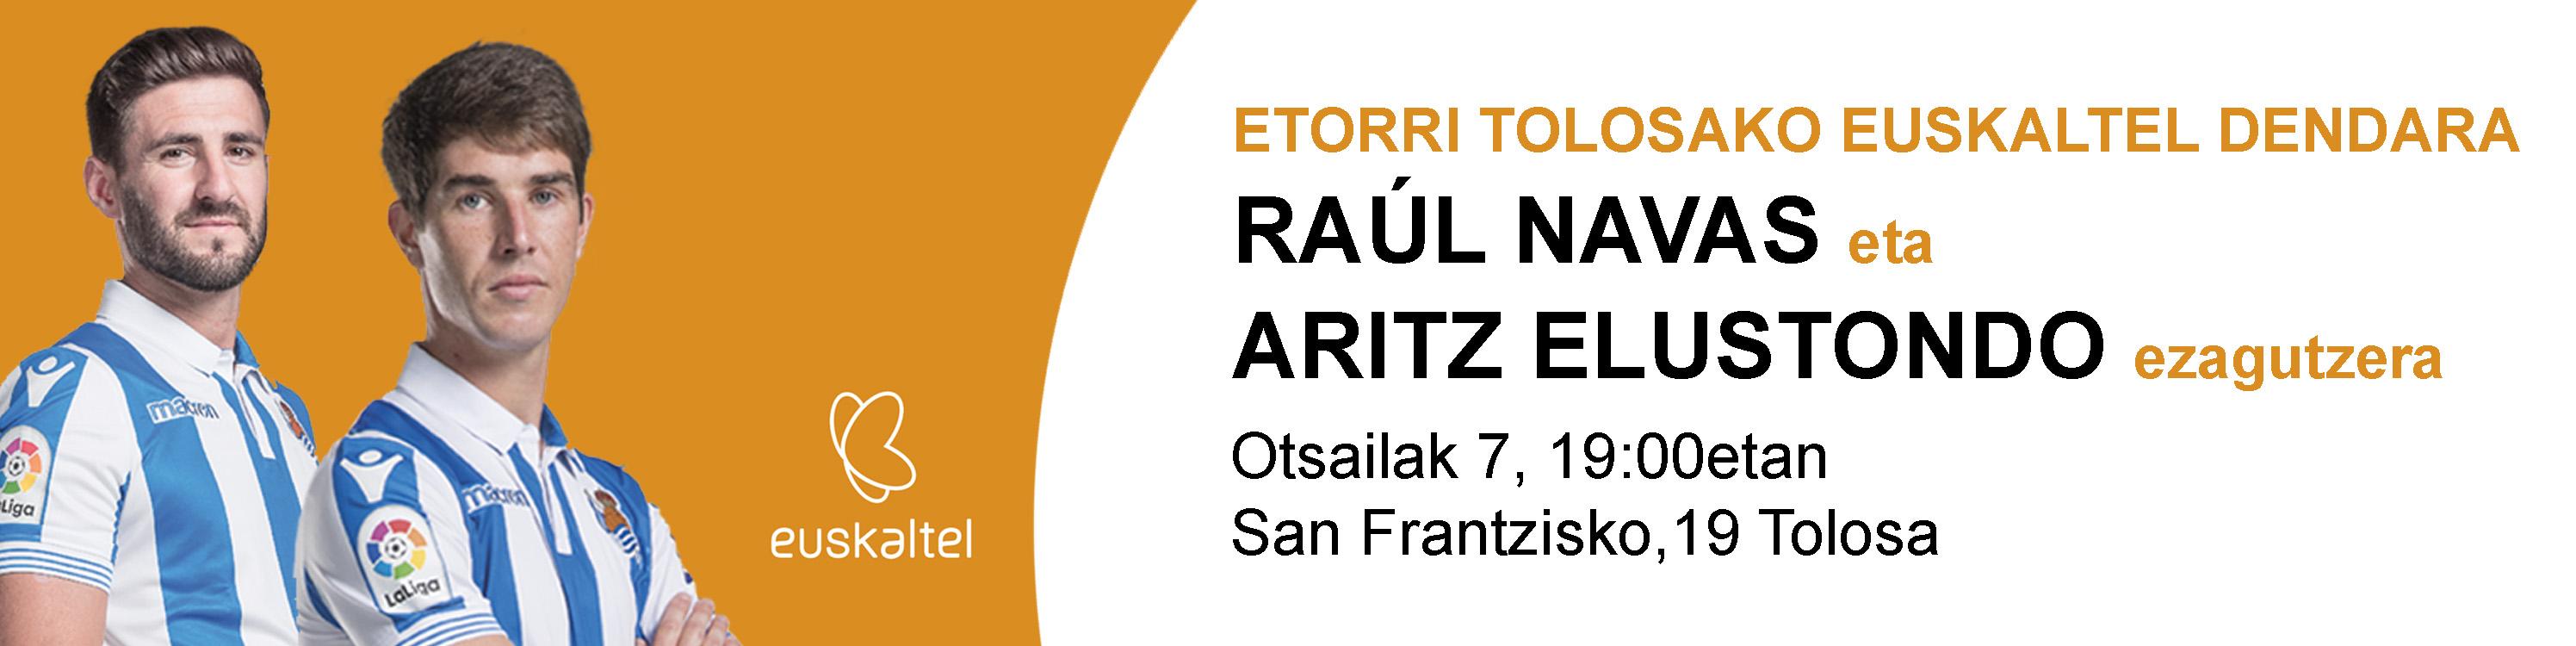 No te pierdas a Aritz Elustondo y Raúl Navas en la tienda Euskaltel de Tolosa el próximo jueves, 7 de febrero